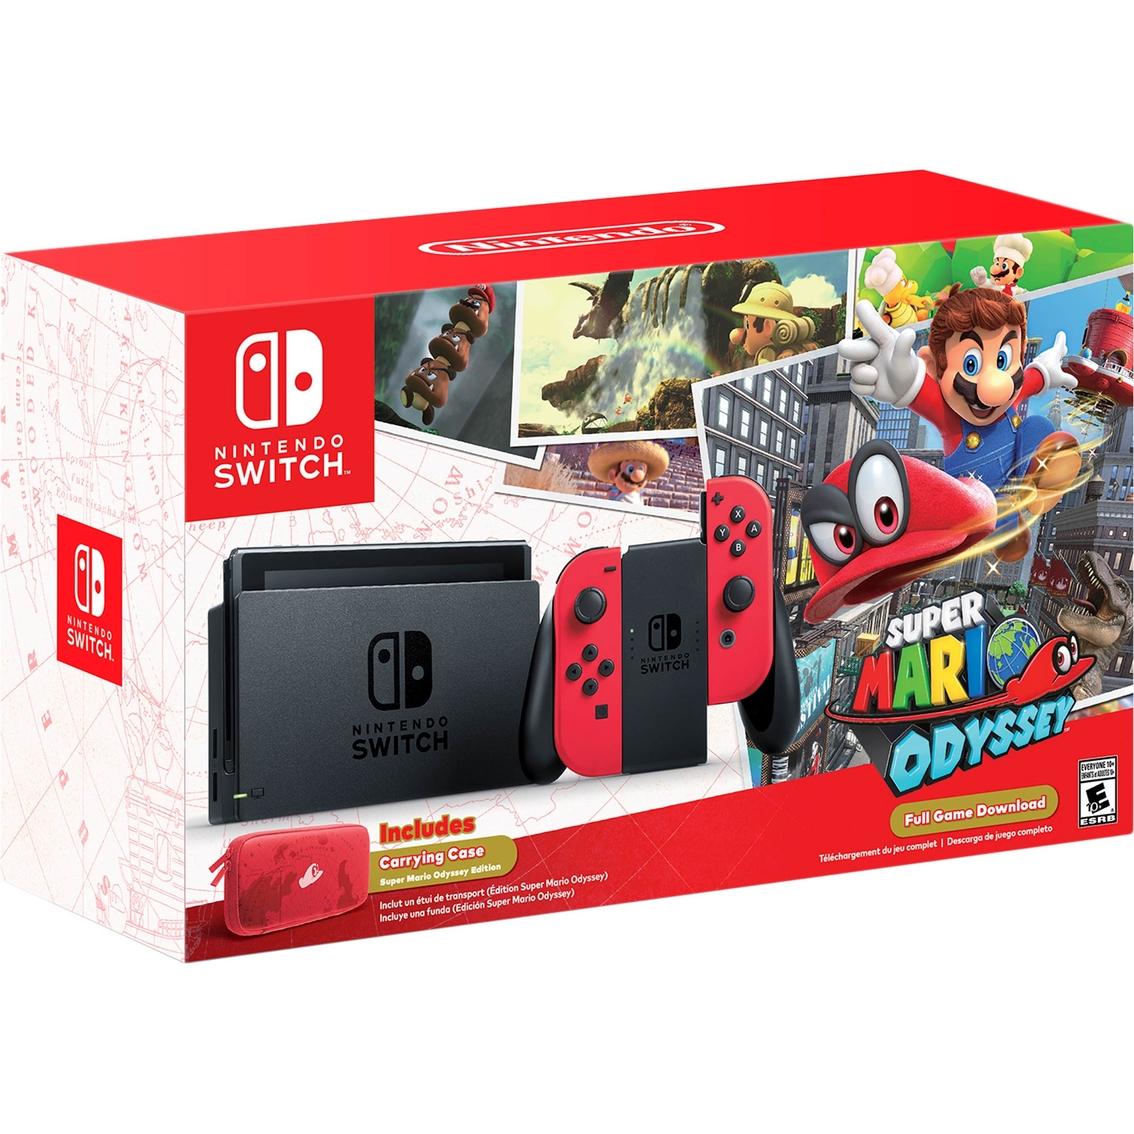 Nintendo Switch Super Mario Odyssey Edition Hardware